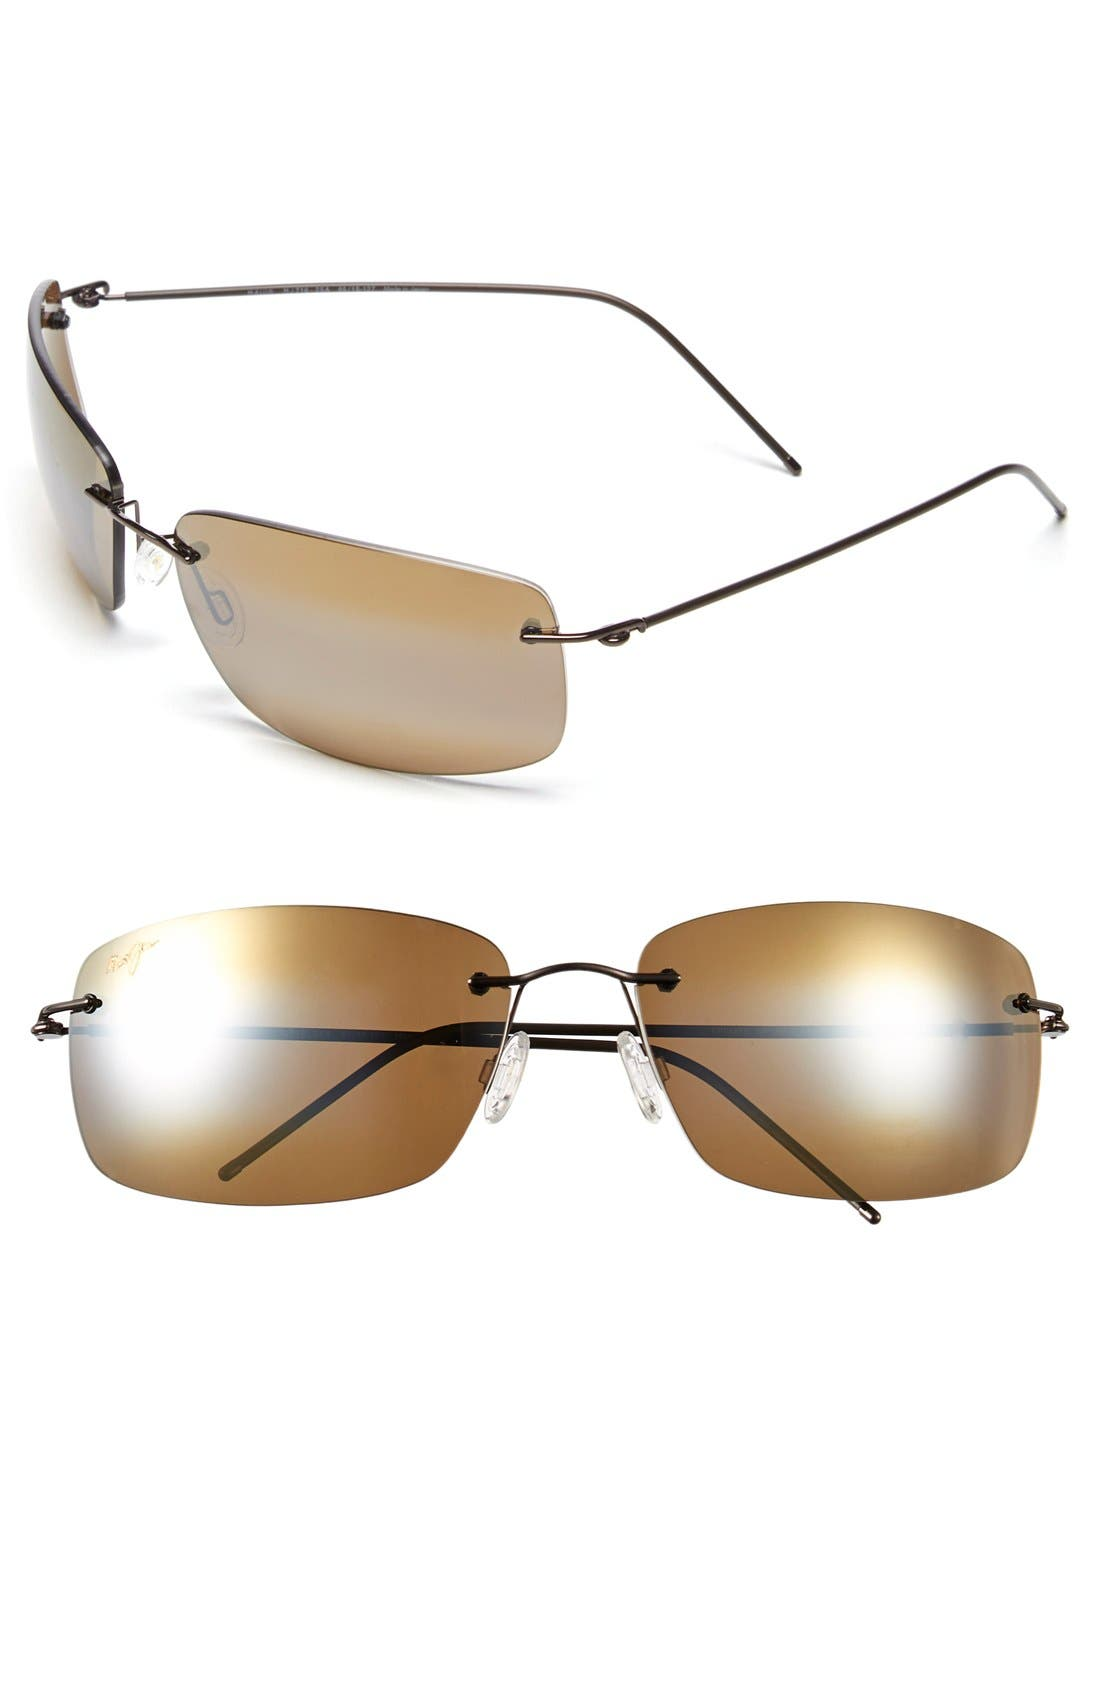 6b78ff64668c MAUI JIM 'Frigate - Polarizedplus2' 65Mm Polarized Sunglasses - Gloss Dark  Brown/ Hcl